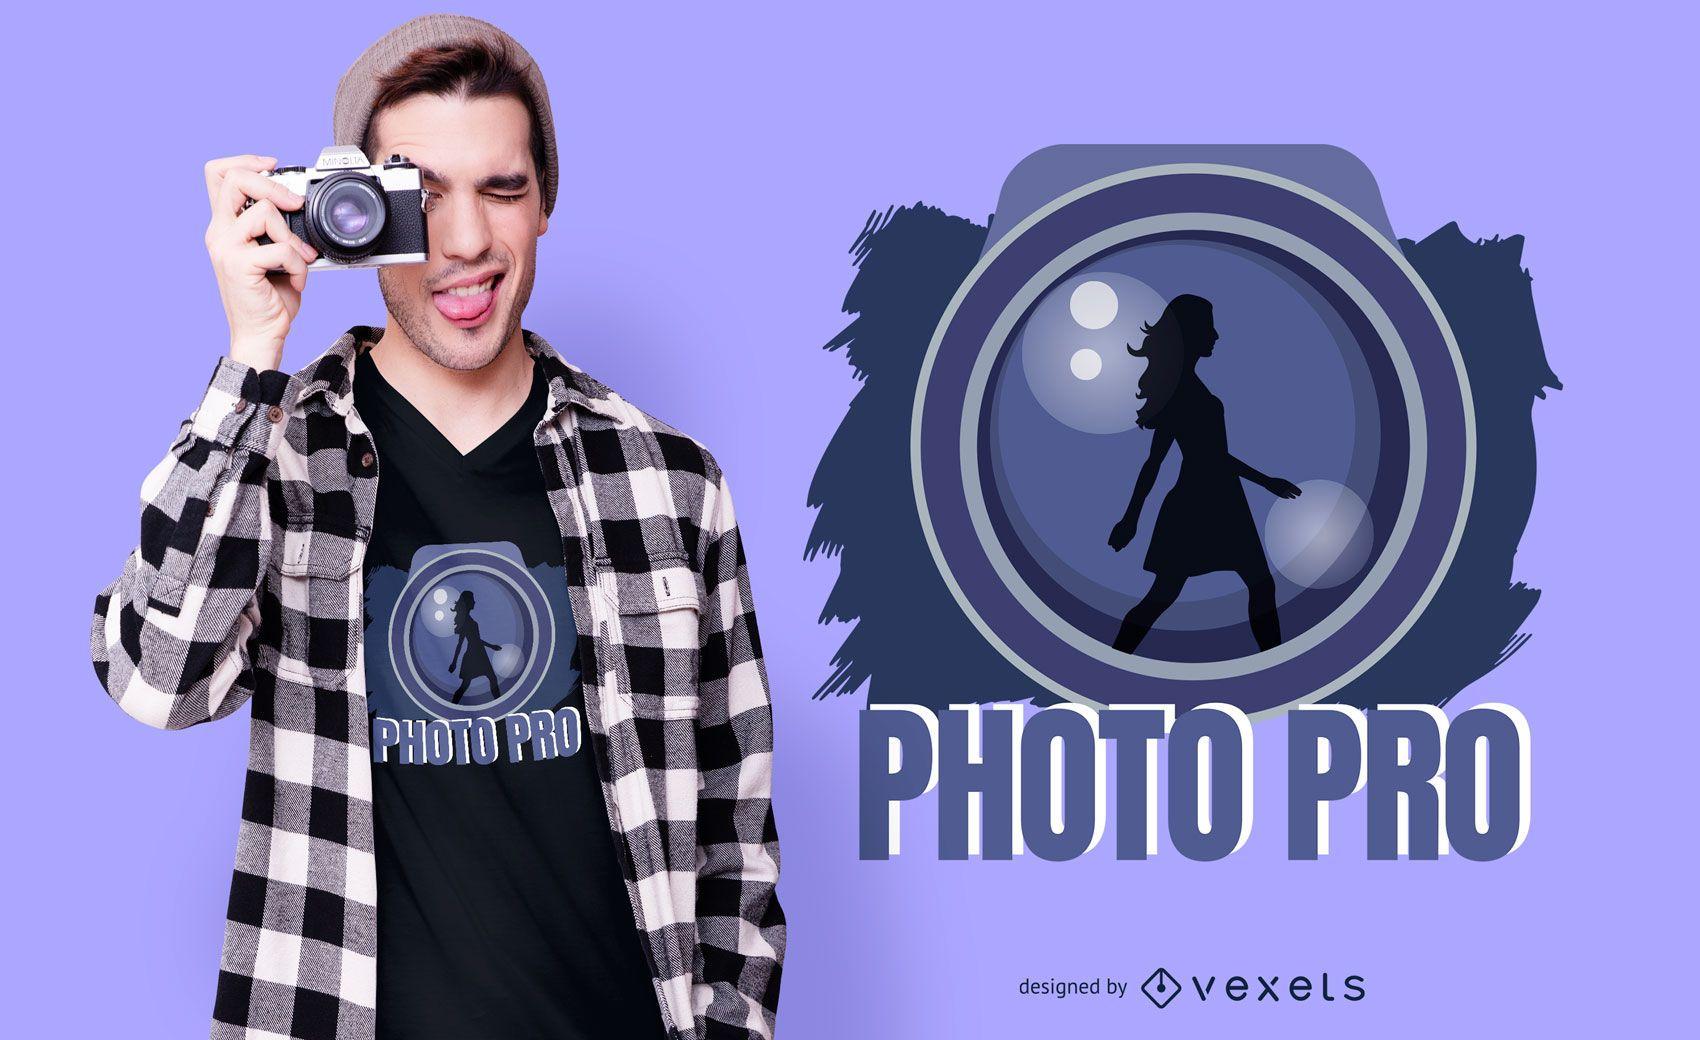 Photo Pro T-shirt Design